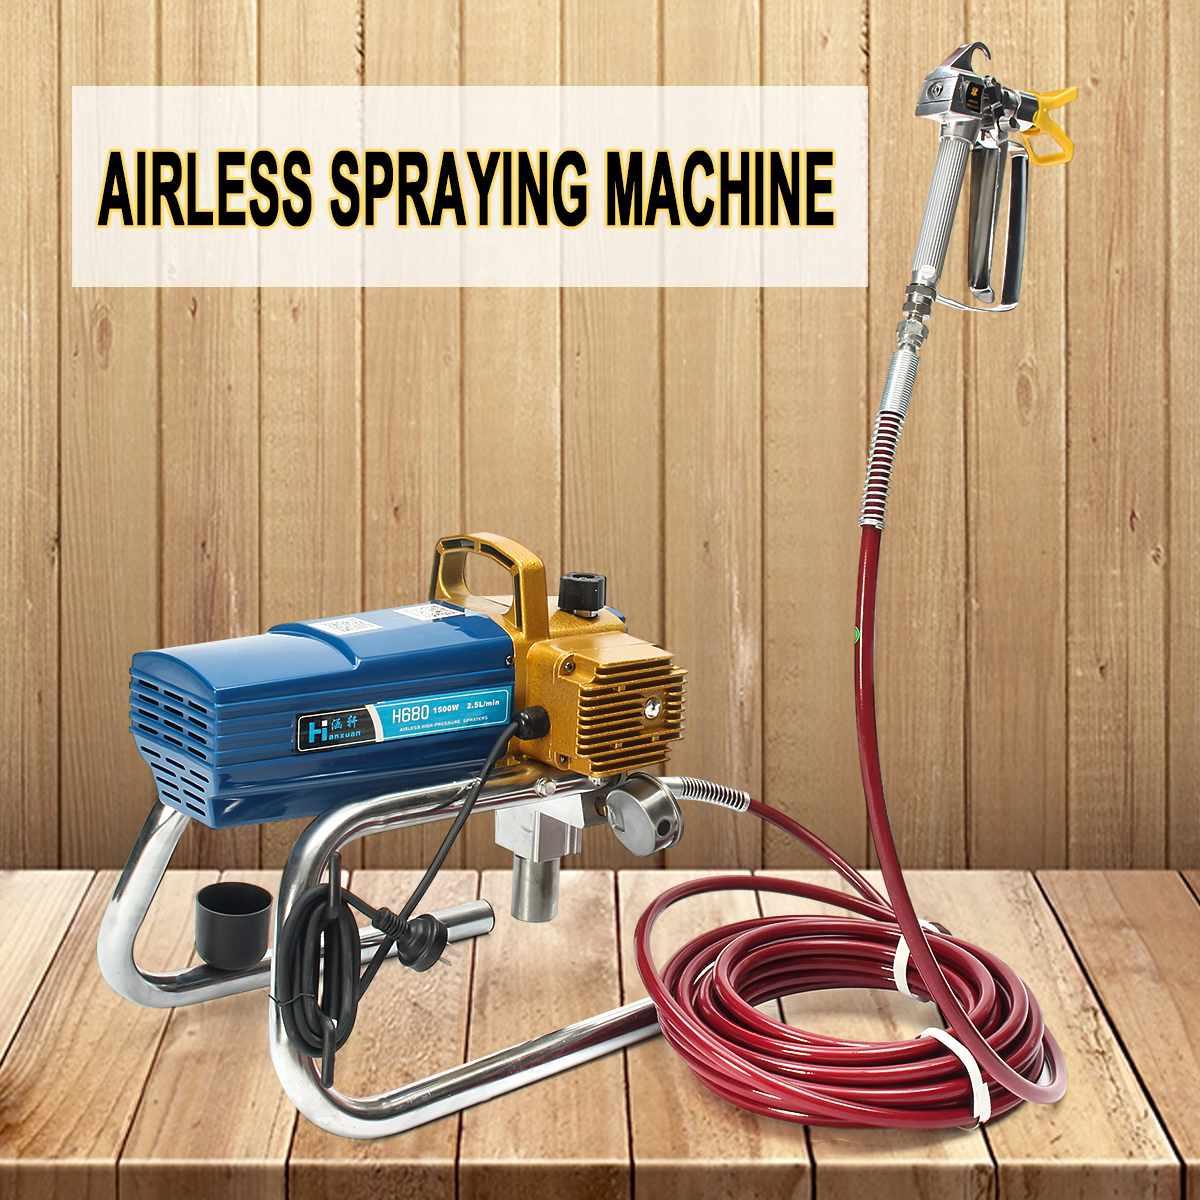 H680 Alta-pressão Airless Airless Spray De Pintura Aerógrafo Pulverizador 1500 W 220 V Gu n Para A Arte Da Pintura Auto ferramenta de reparo